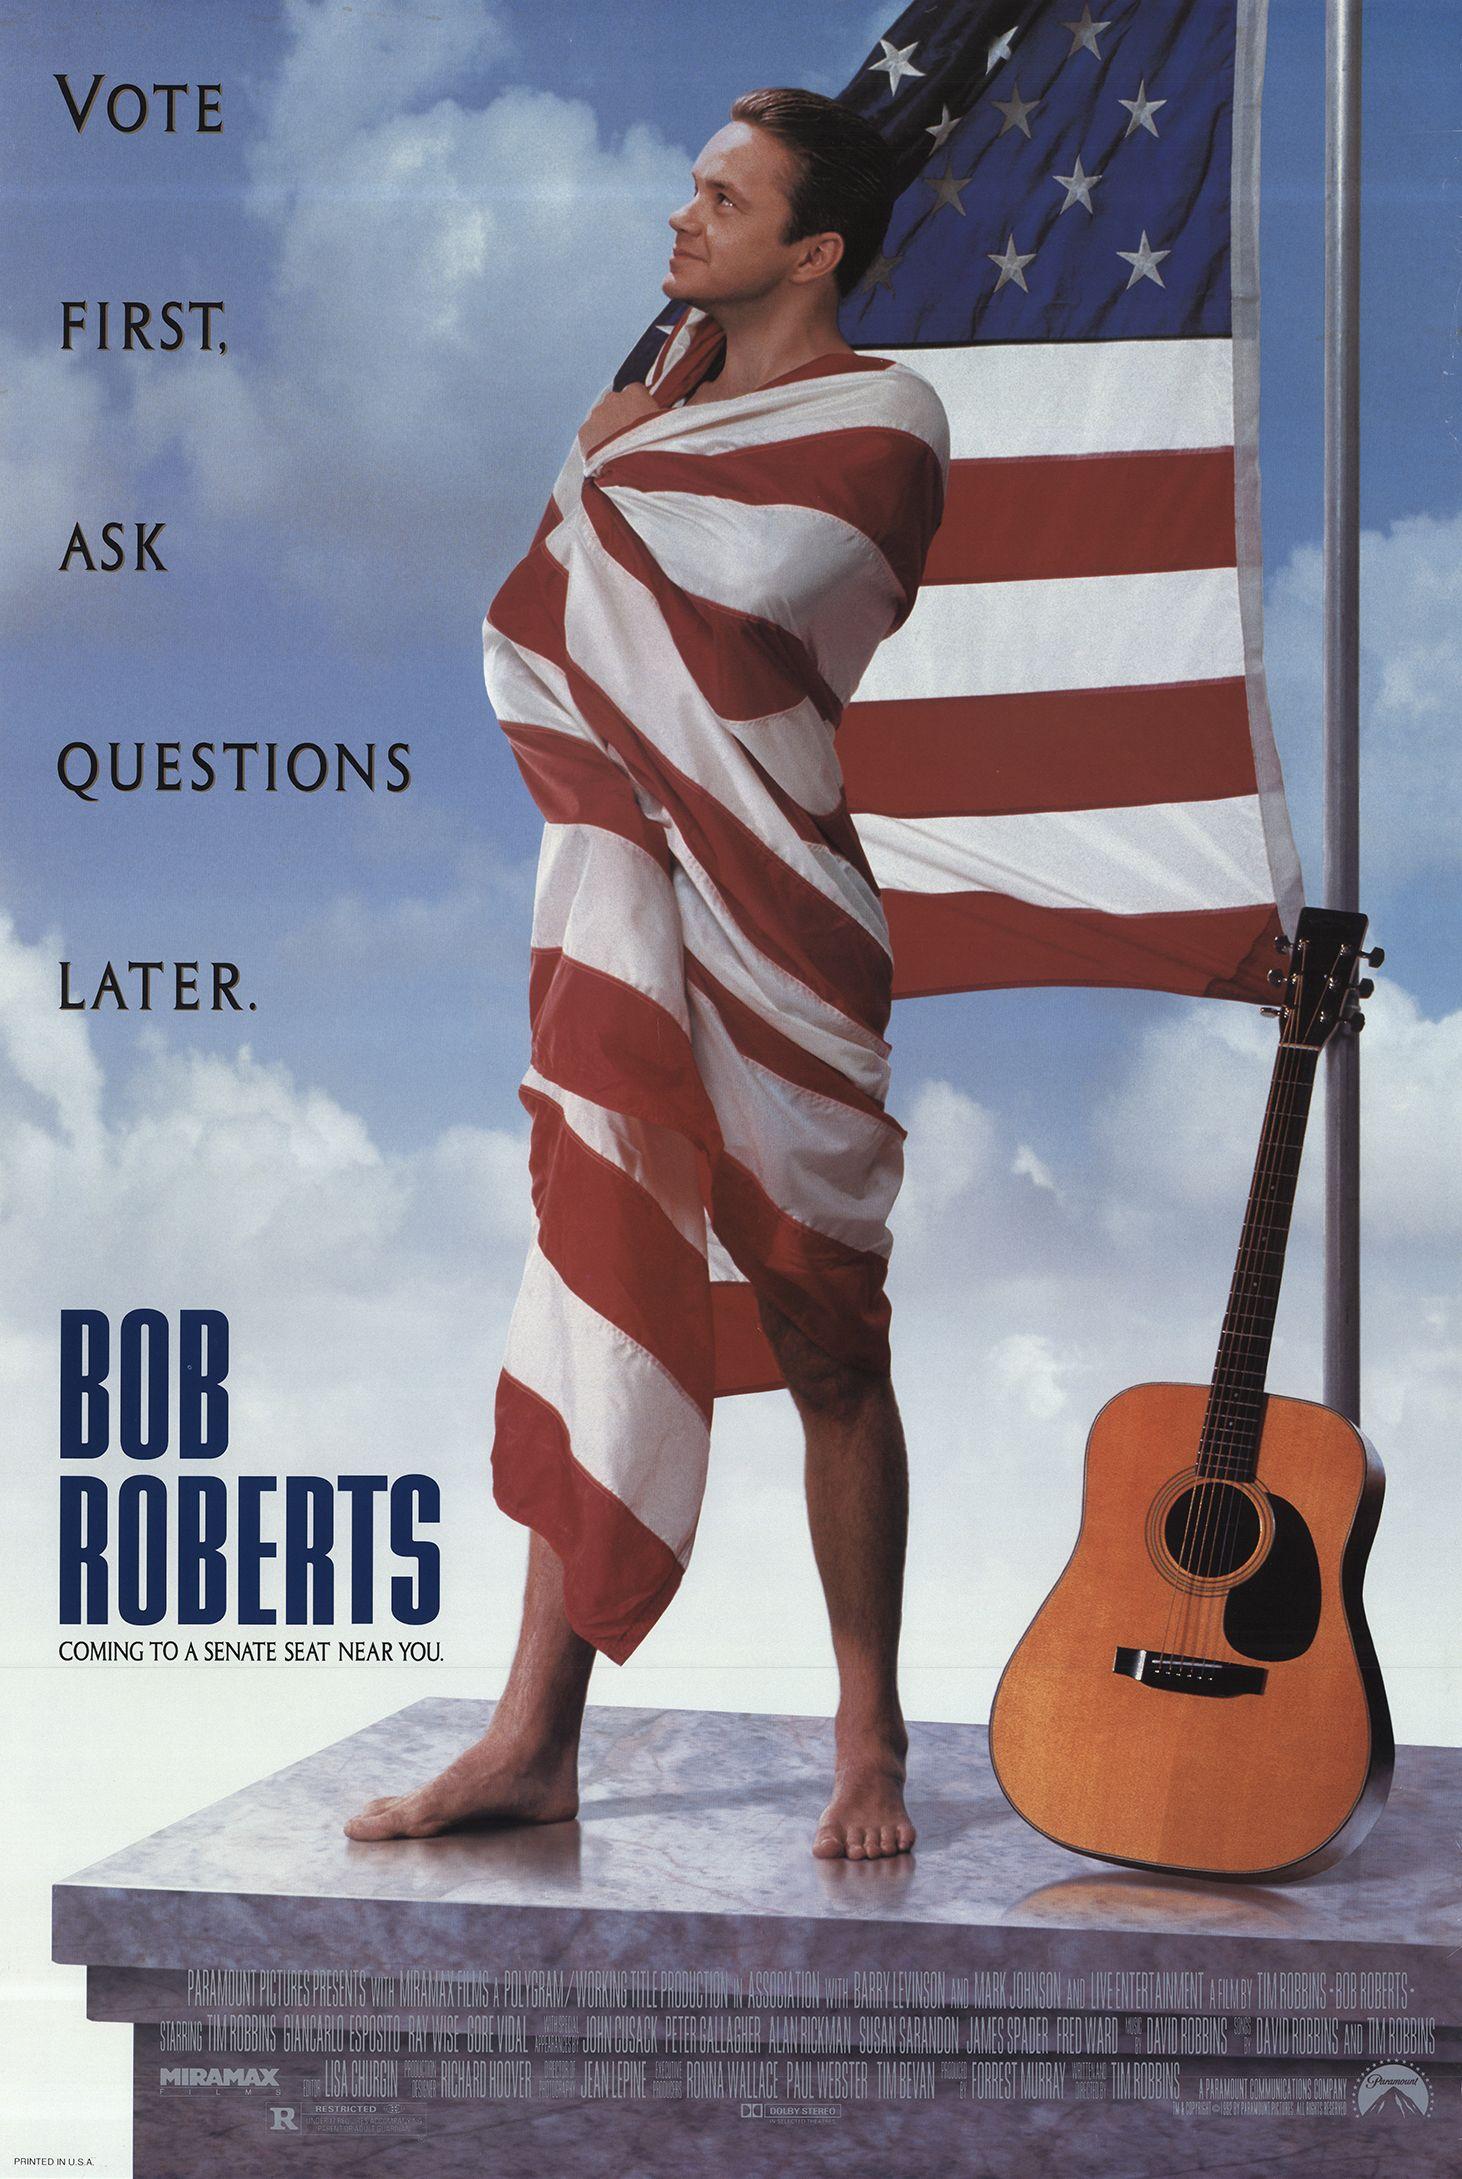 bob roberts movie cast